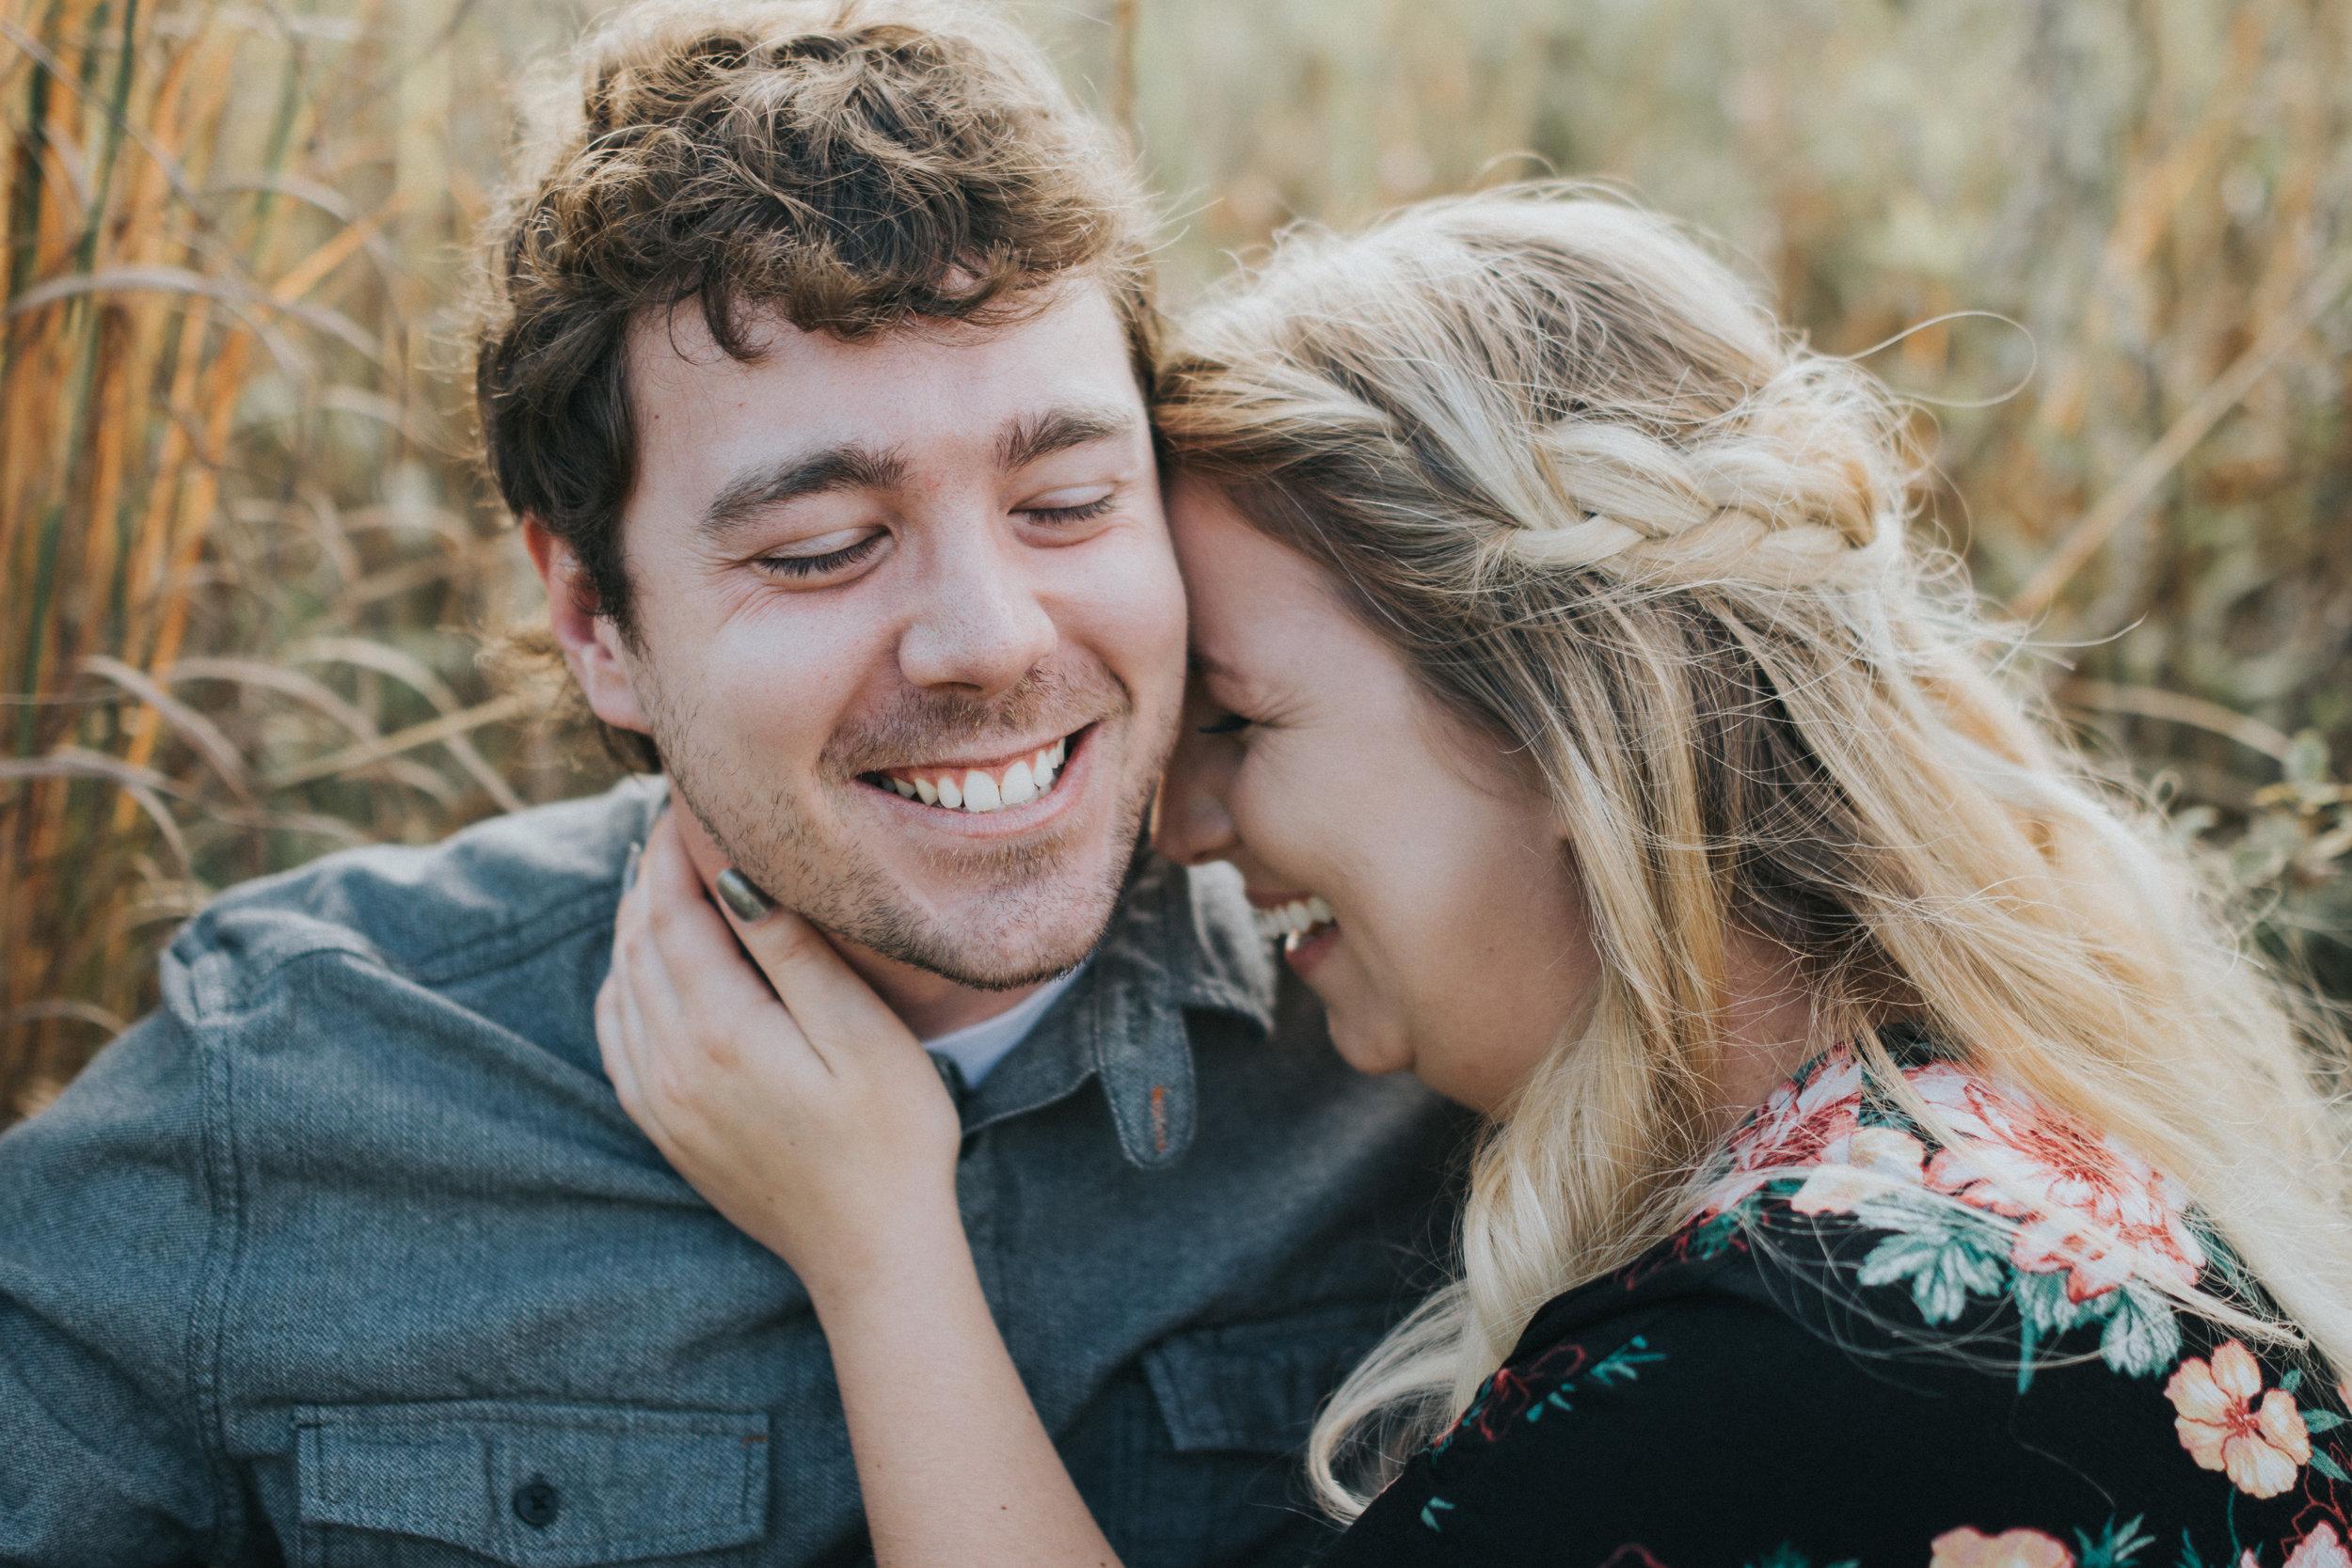 Cate_Ann_Photography_Dayton_Ohio_Wedding_Elopement_And_Engagement_PhotographerDSC_1128.jpg